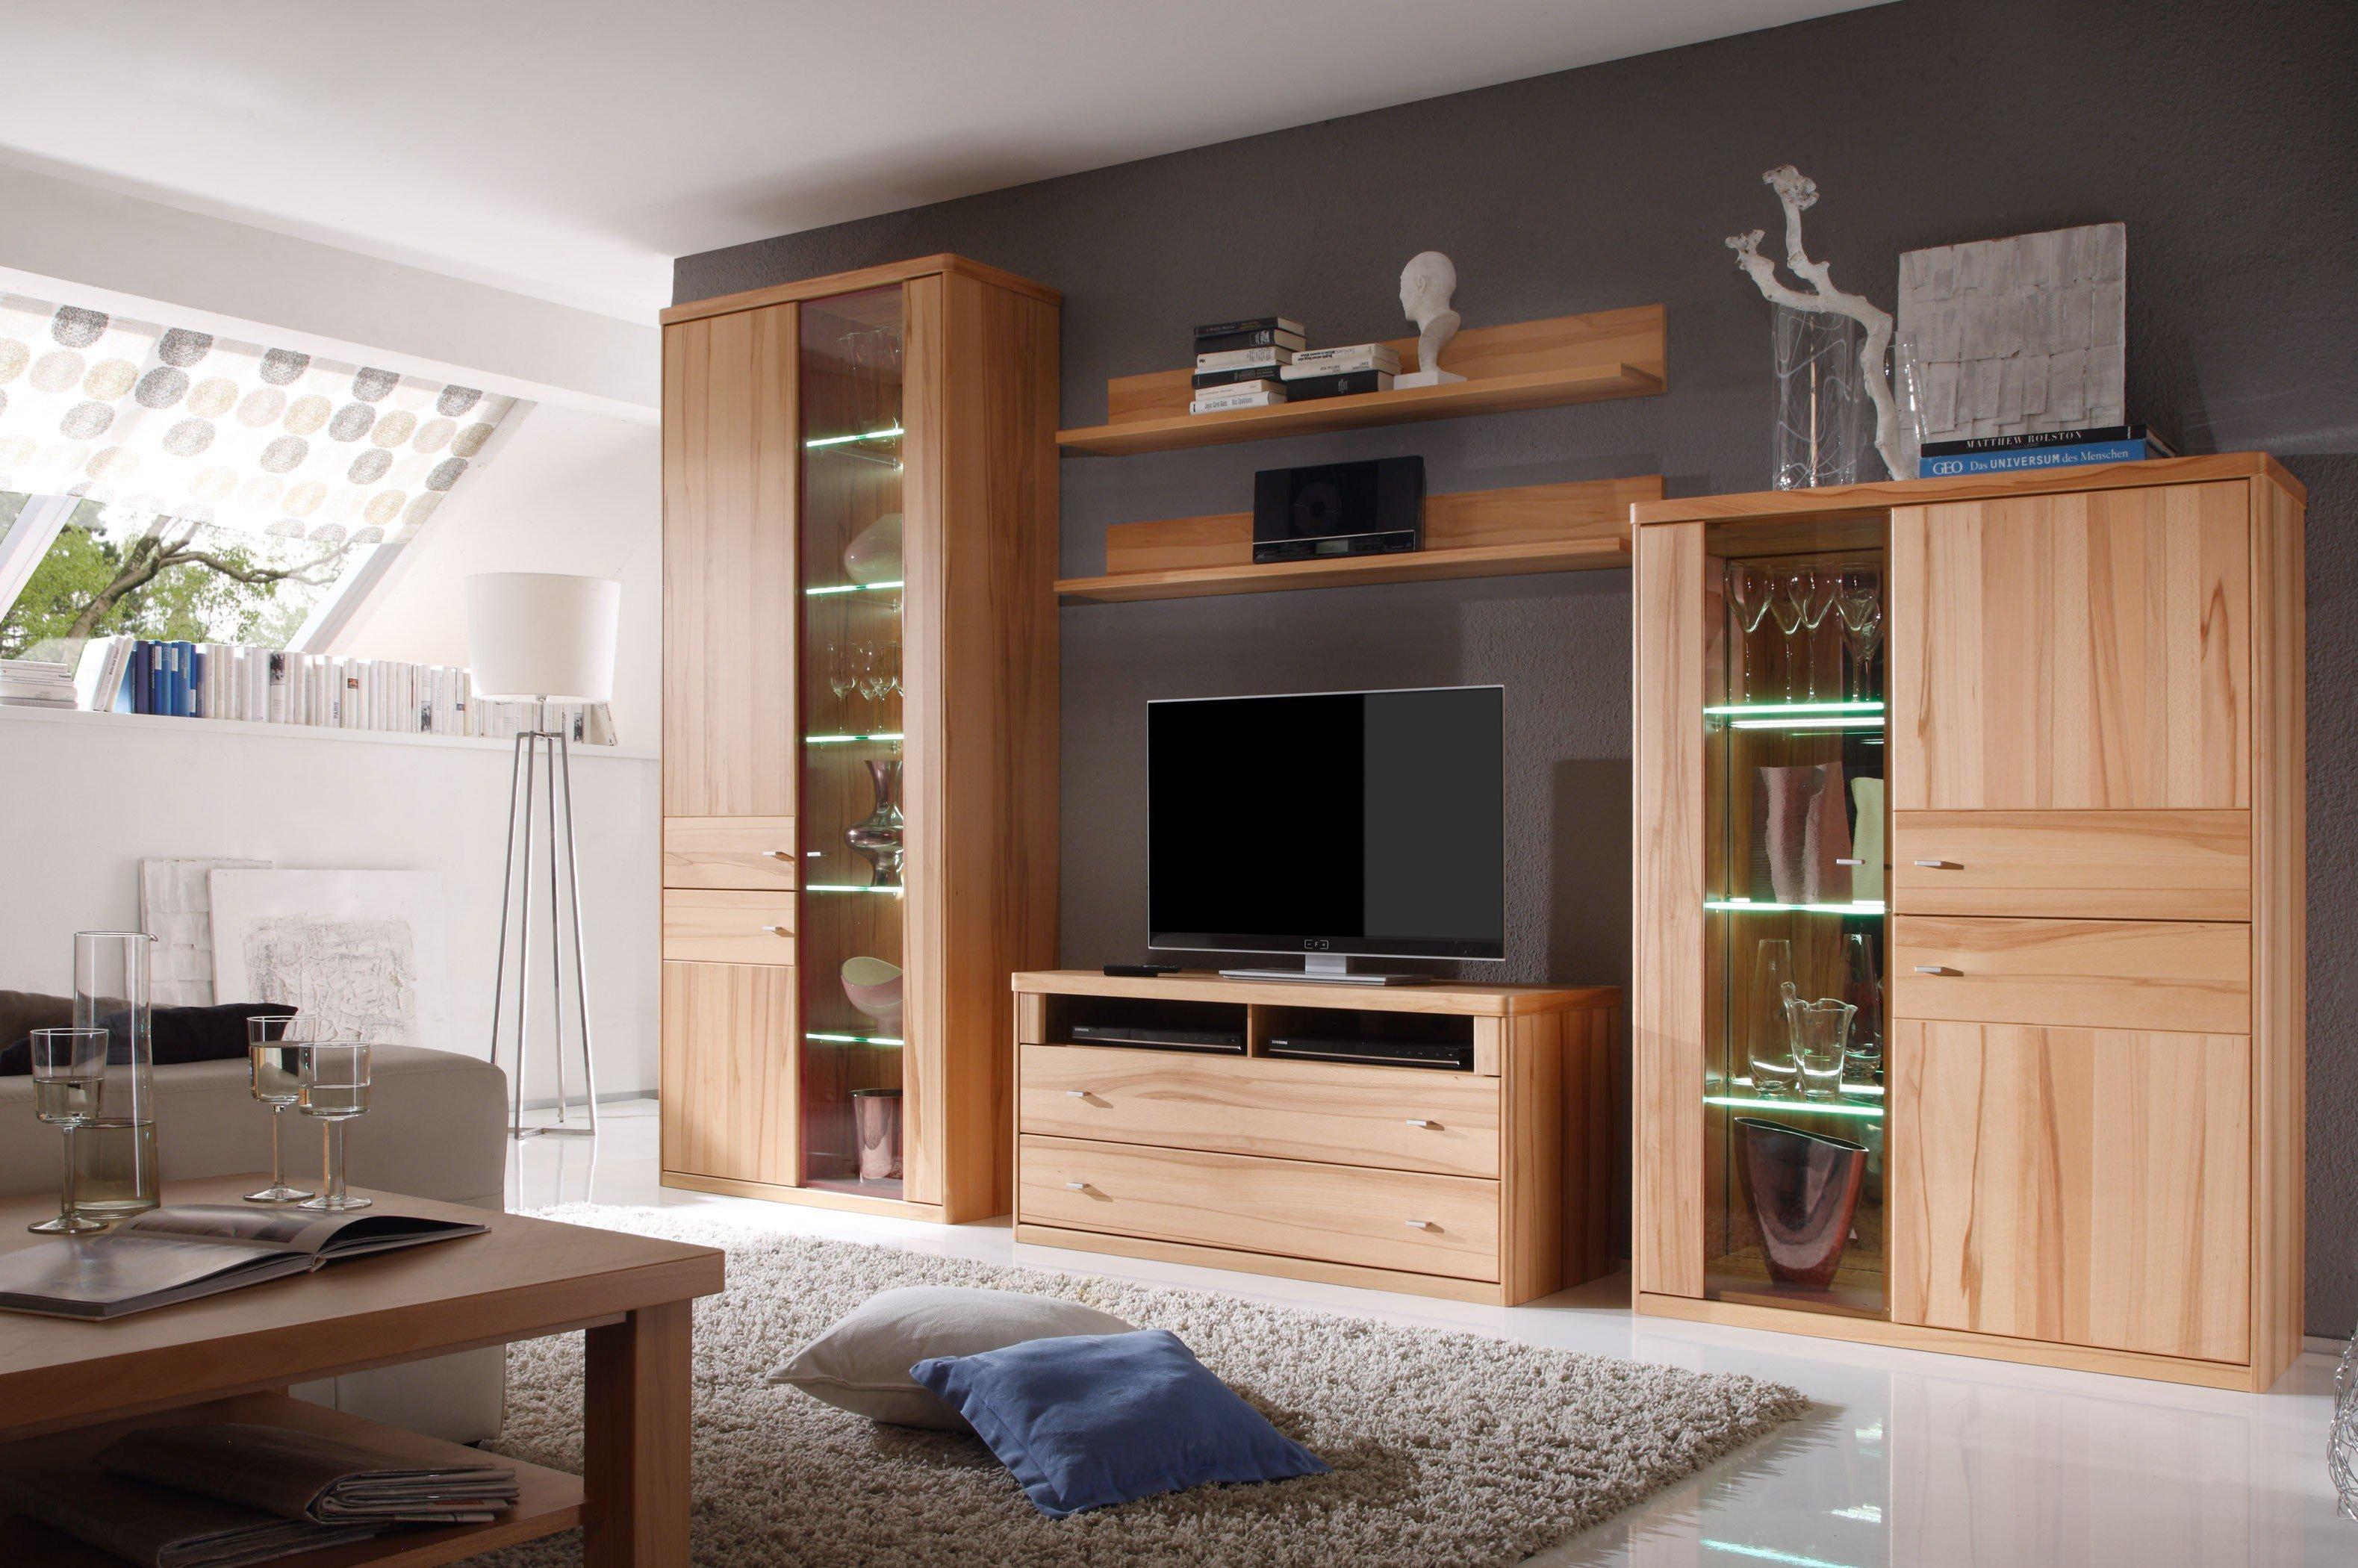 wehrsdorfer wohnwand andorra v 610 kernbuche m bel letz ihr online shop. Black Bedroom Furniture Sets. Home Design Ideas